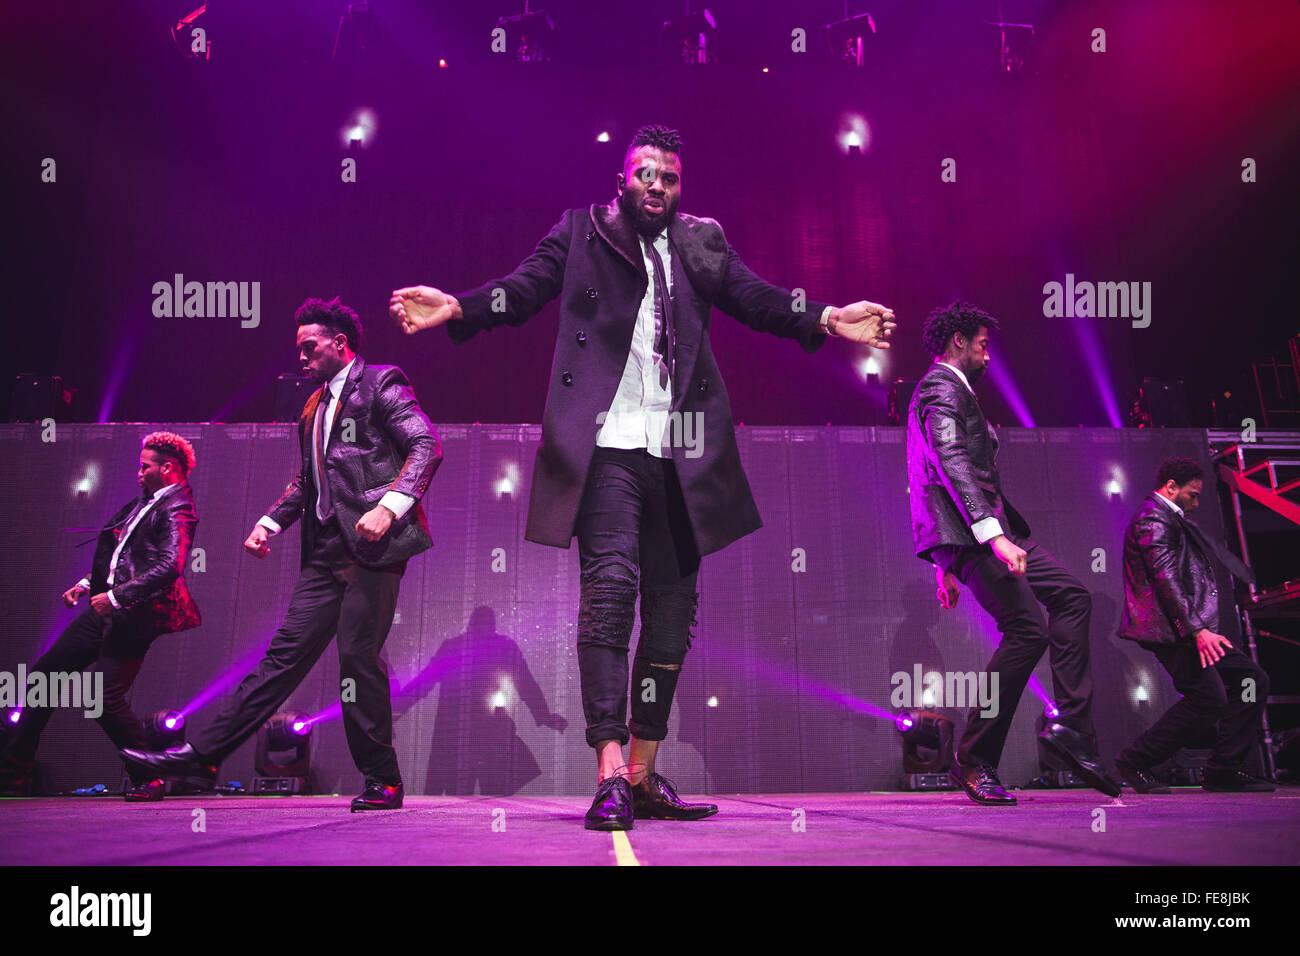 3459 Stockfotos & 3459 Bilder - Alamy